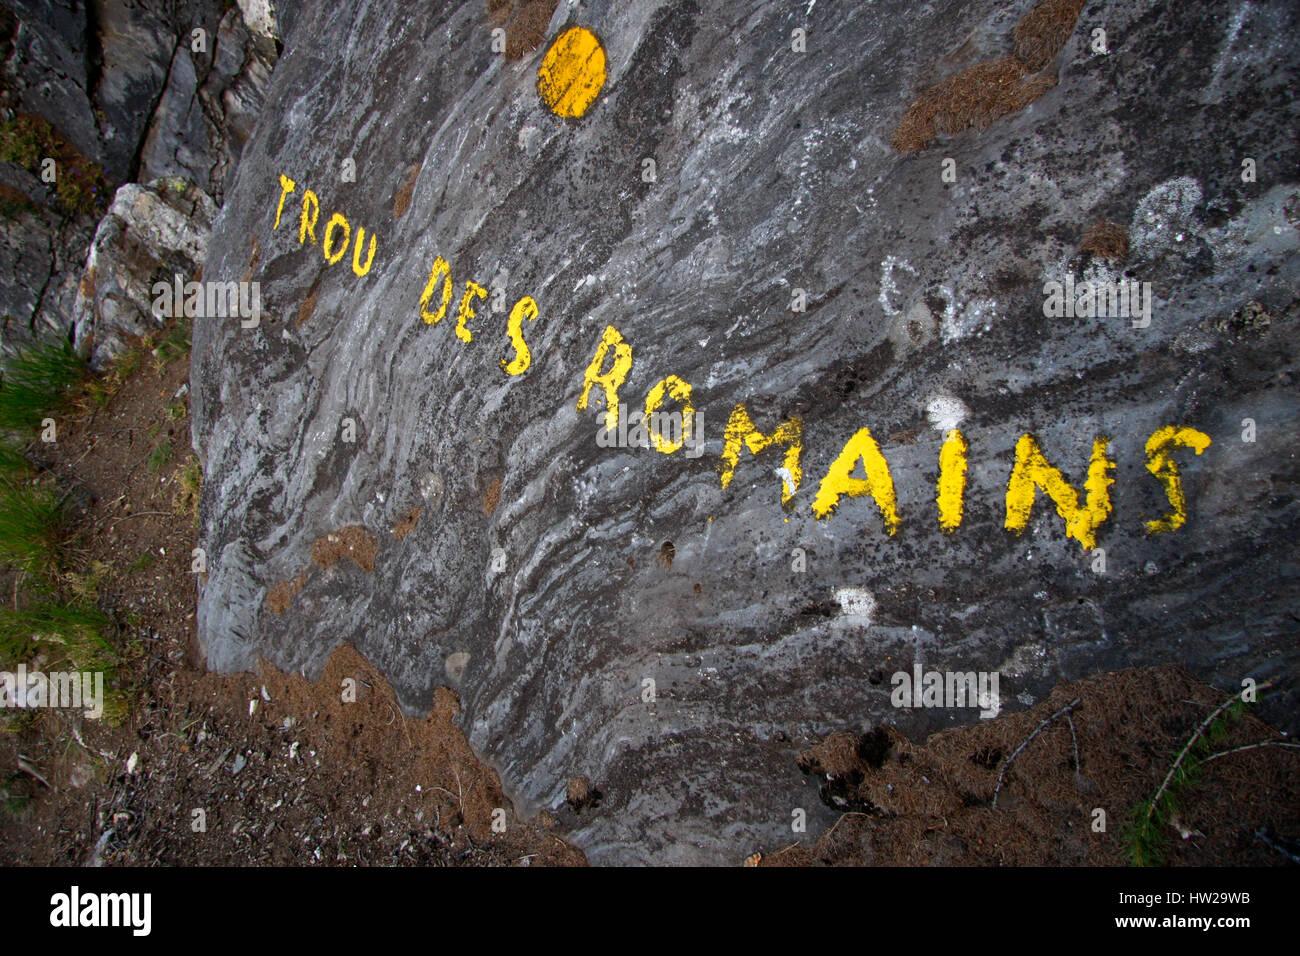 Impressionen: Trou des Romains, Val Veny, Val Ferret, Italien. - Stock Image